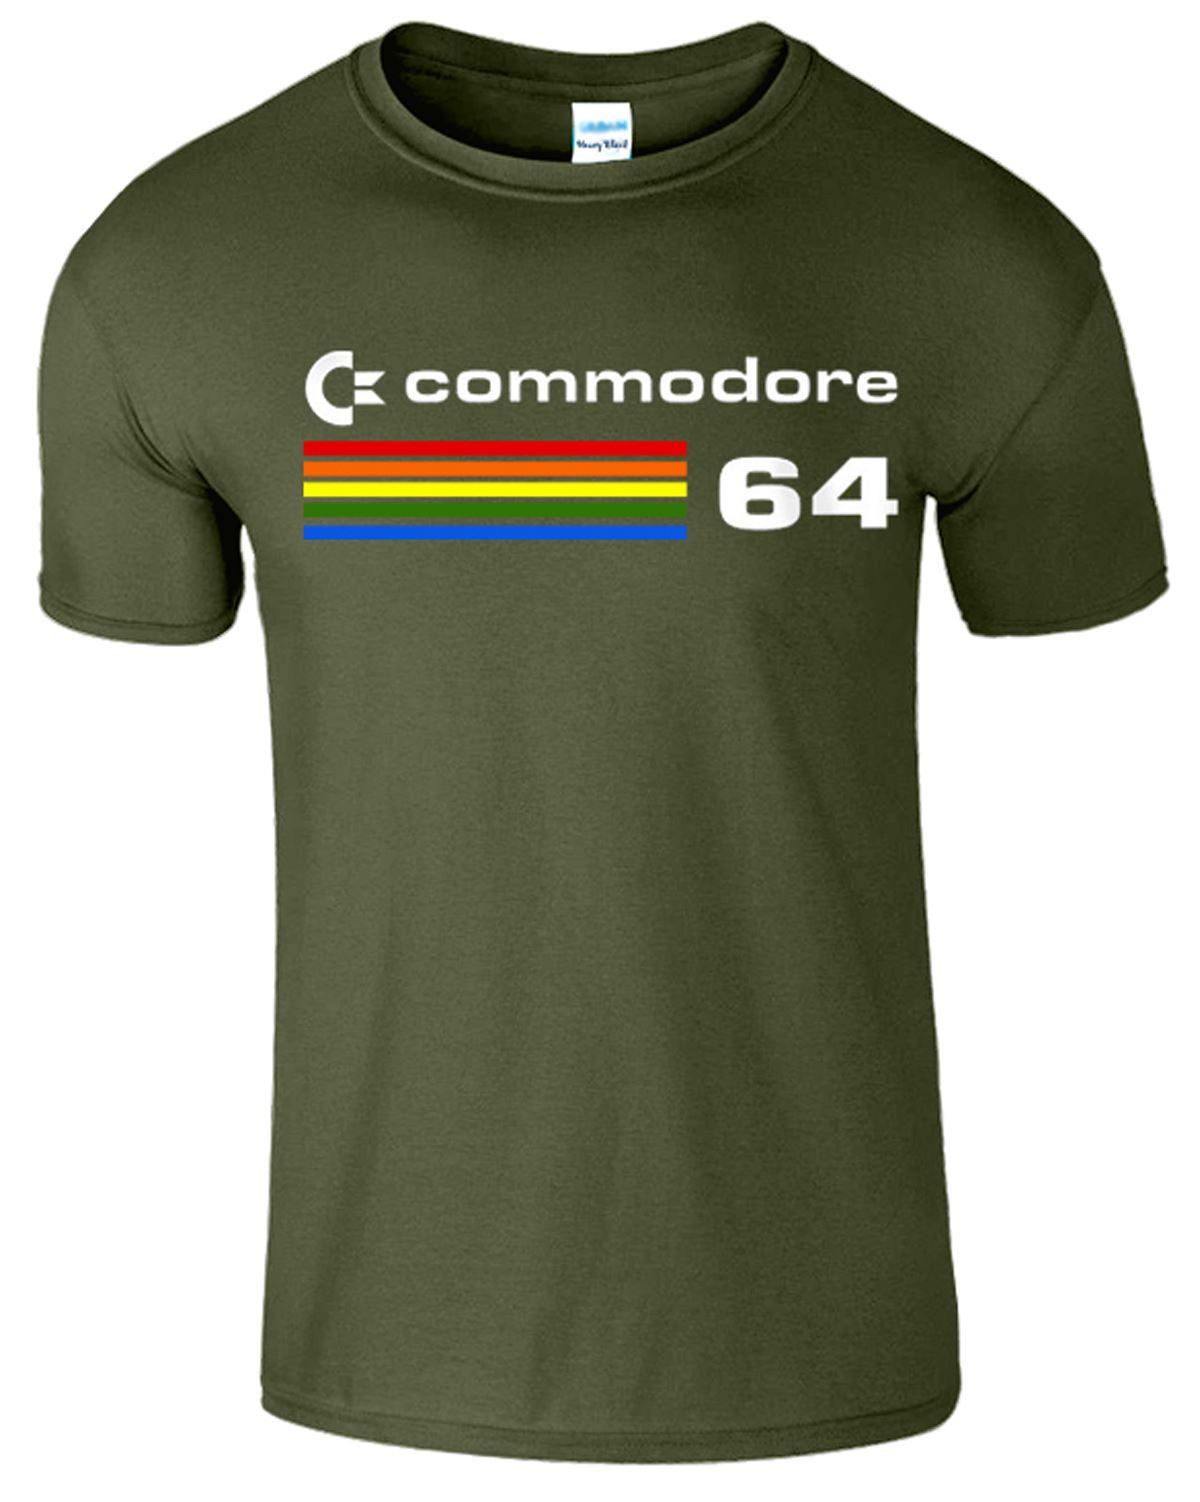 Commodore-64-Mens-T-Shirt-Computer-C64-Retro-80s-Video-Game-PC-Tee-Top-T-Shirt